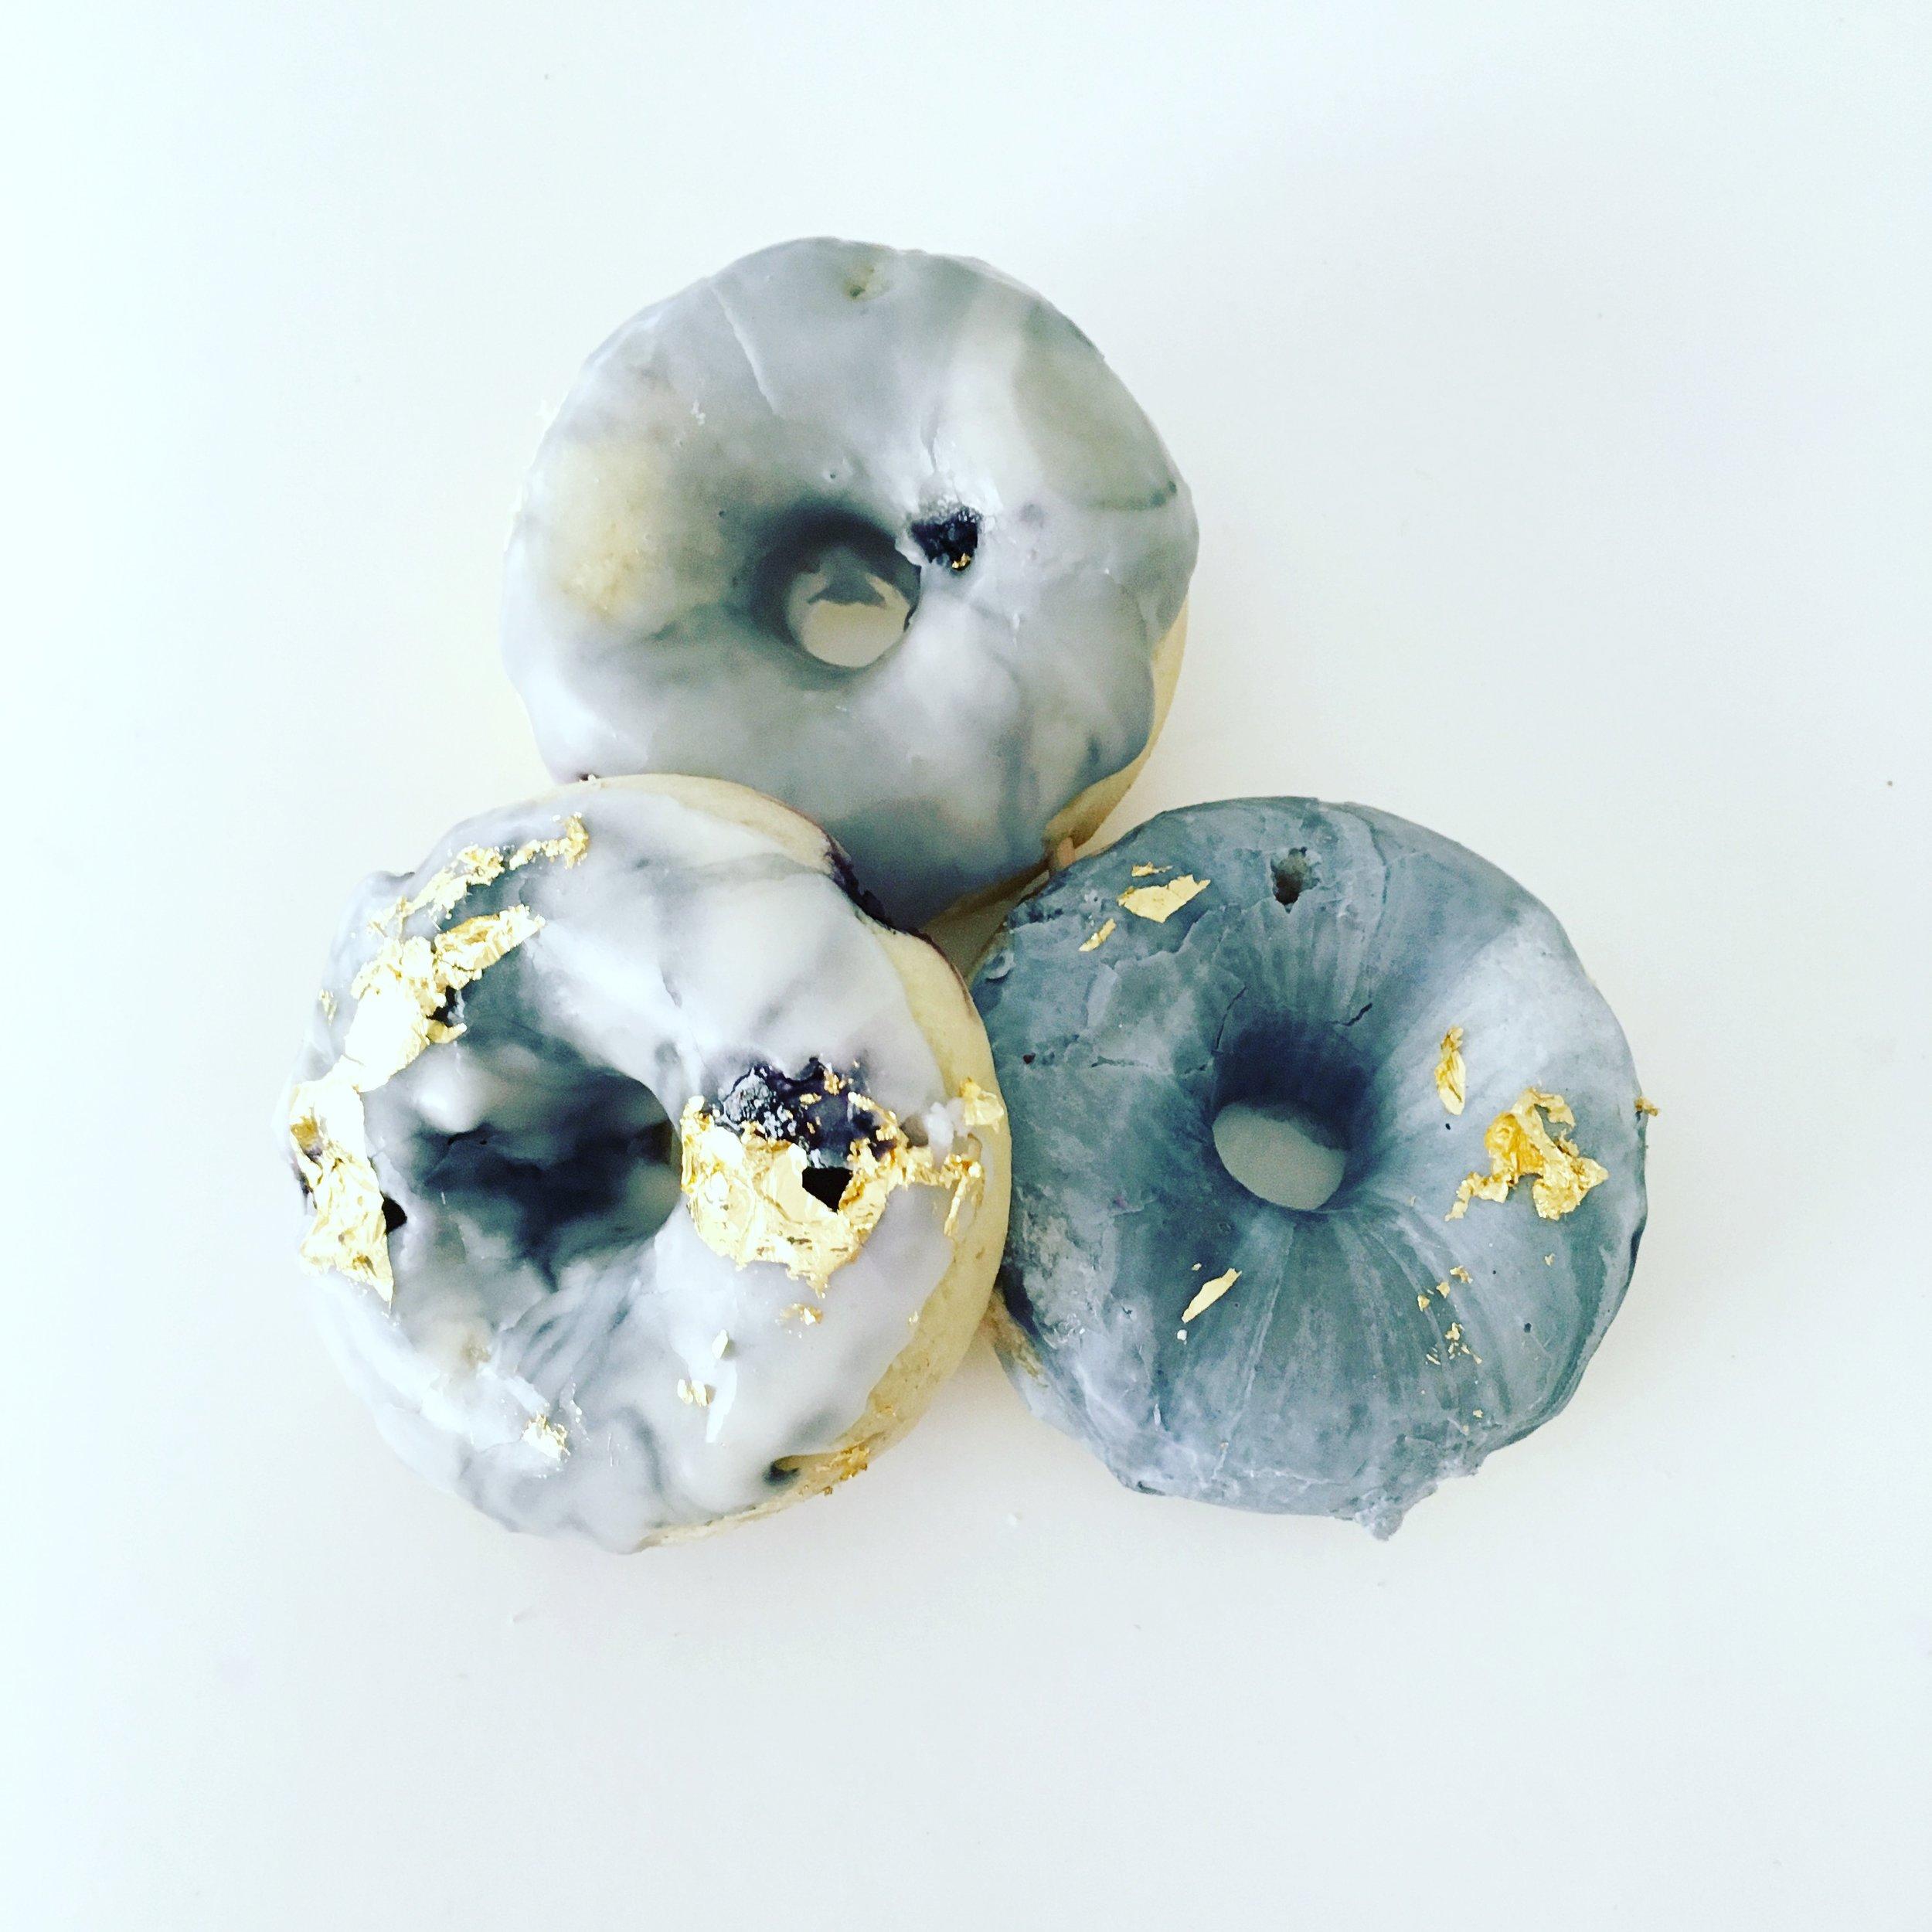 Sweets - MacaronsDonutsCookiesCupcakes